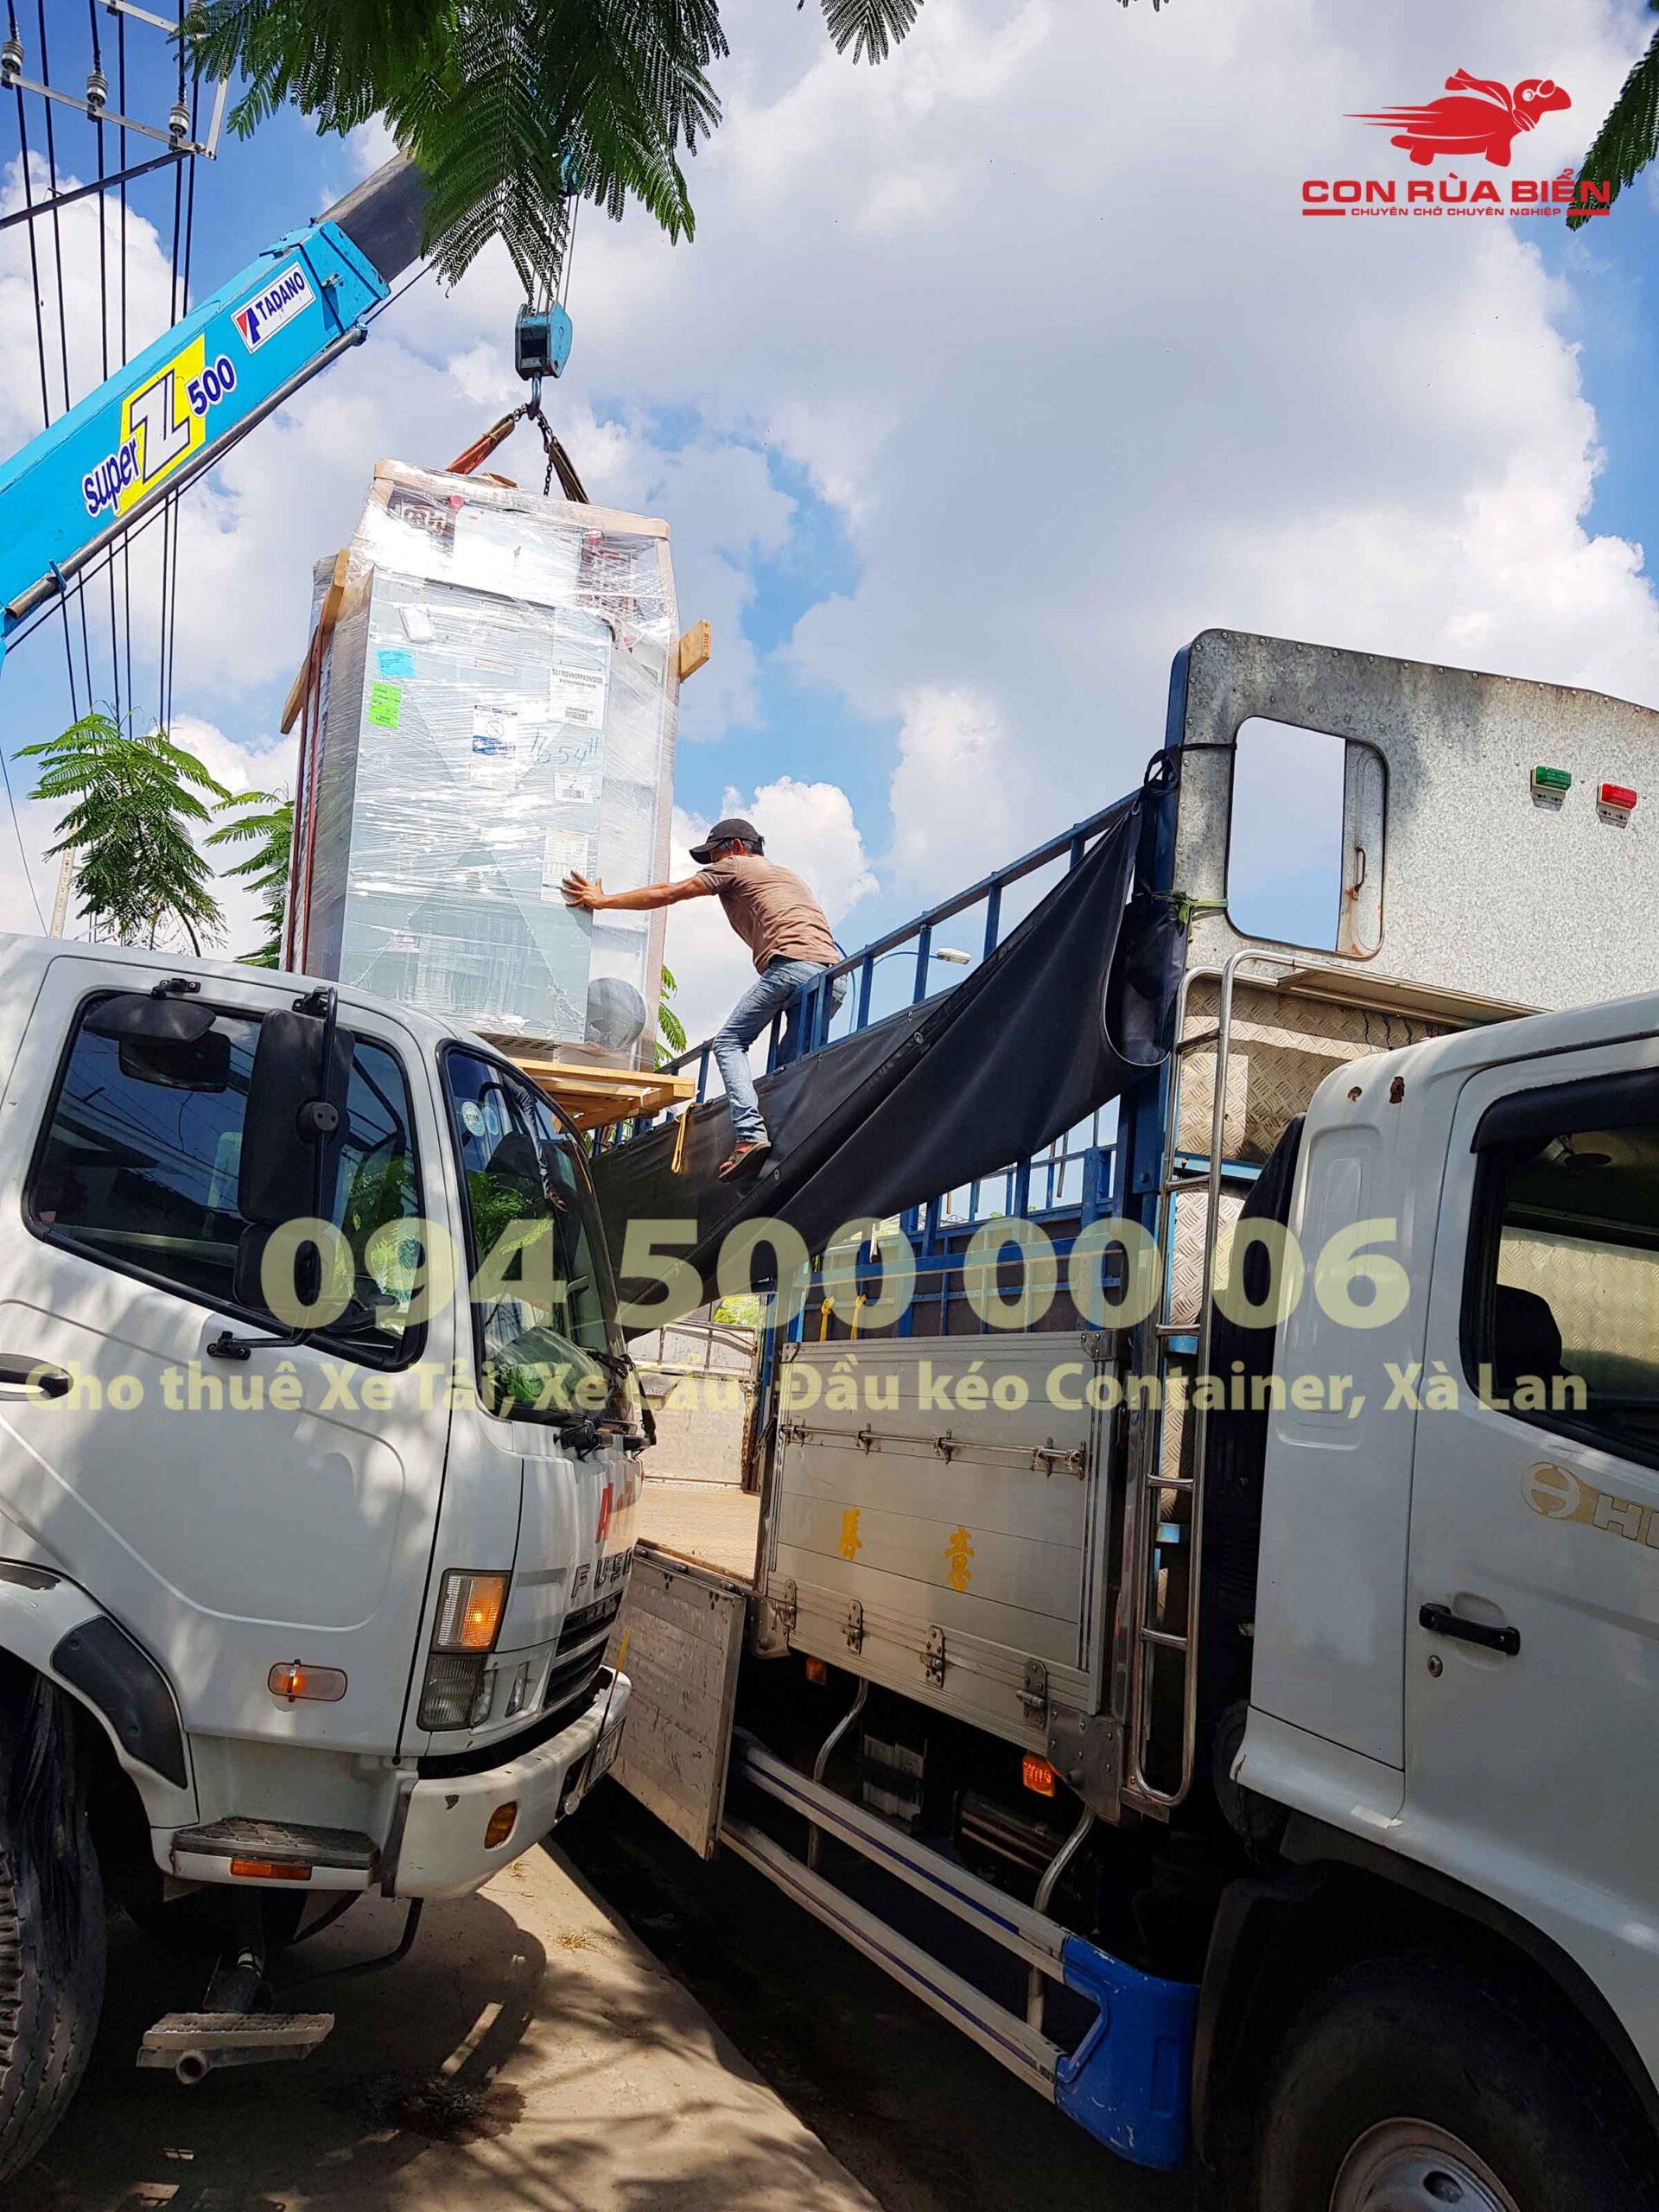 Du an Van chuyen May Giat Say Cong Nghiep di Phu Quoc 5 scaled